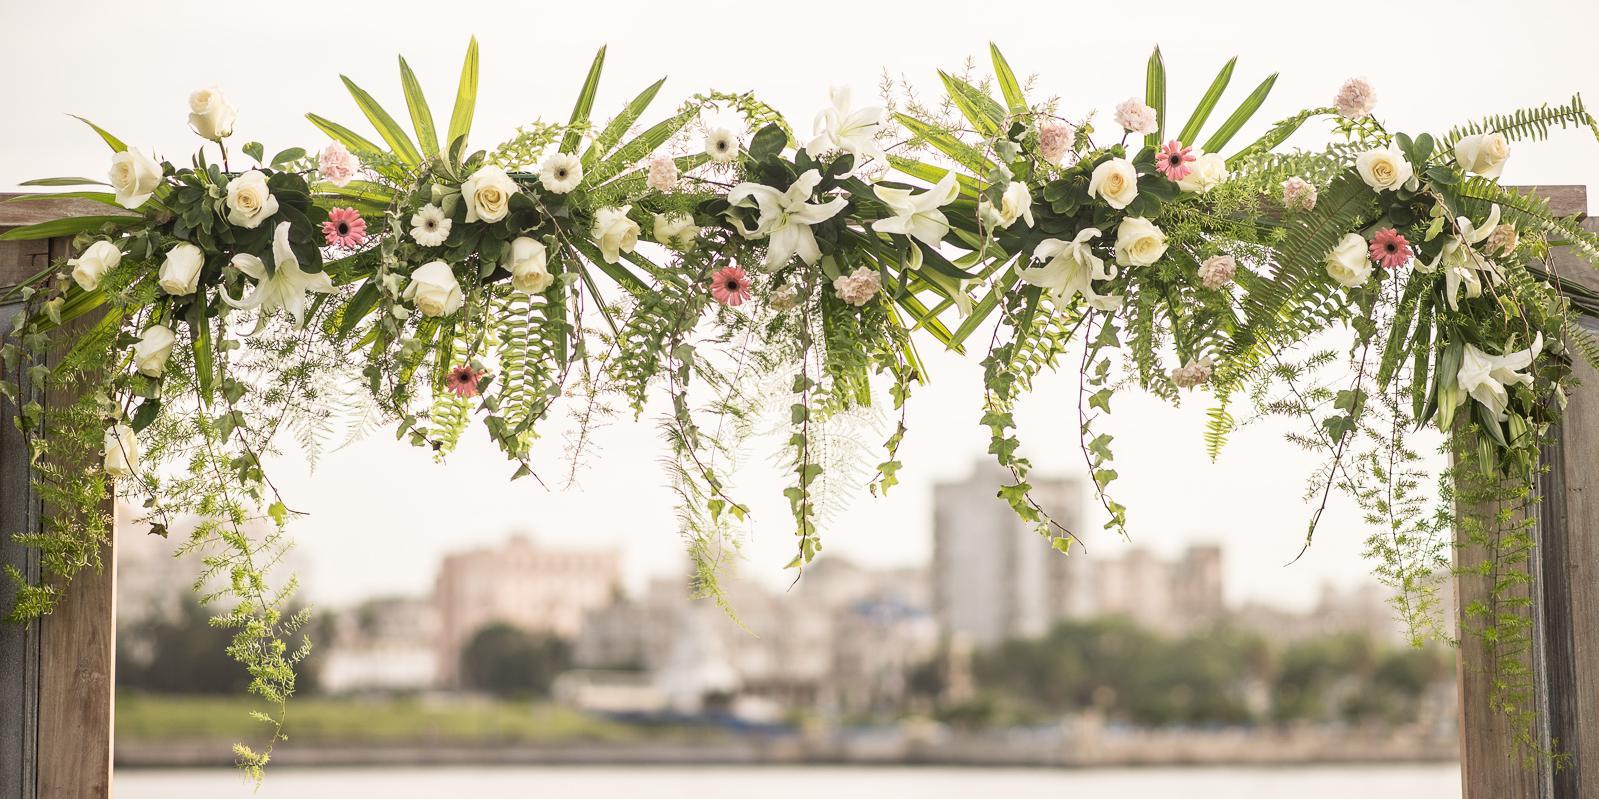 bodas-estilo-libre-jardin-cuba-8771.jpg